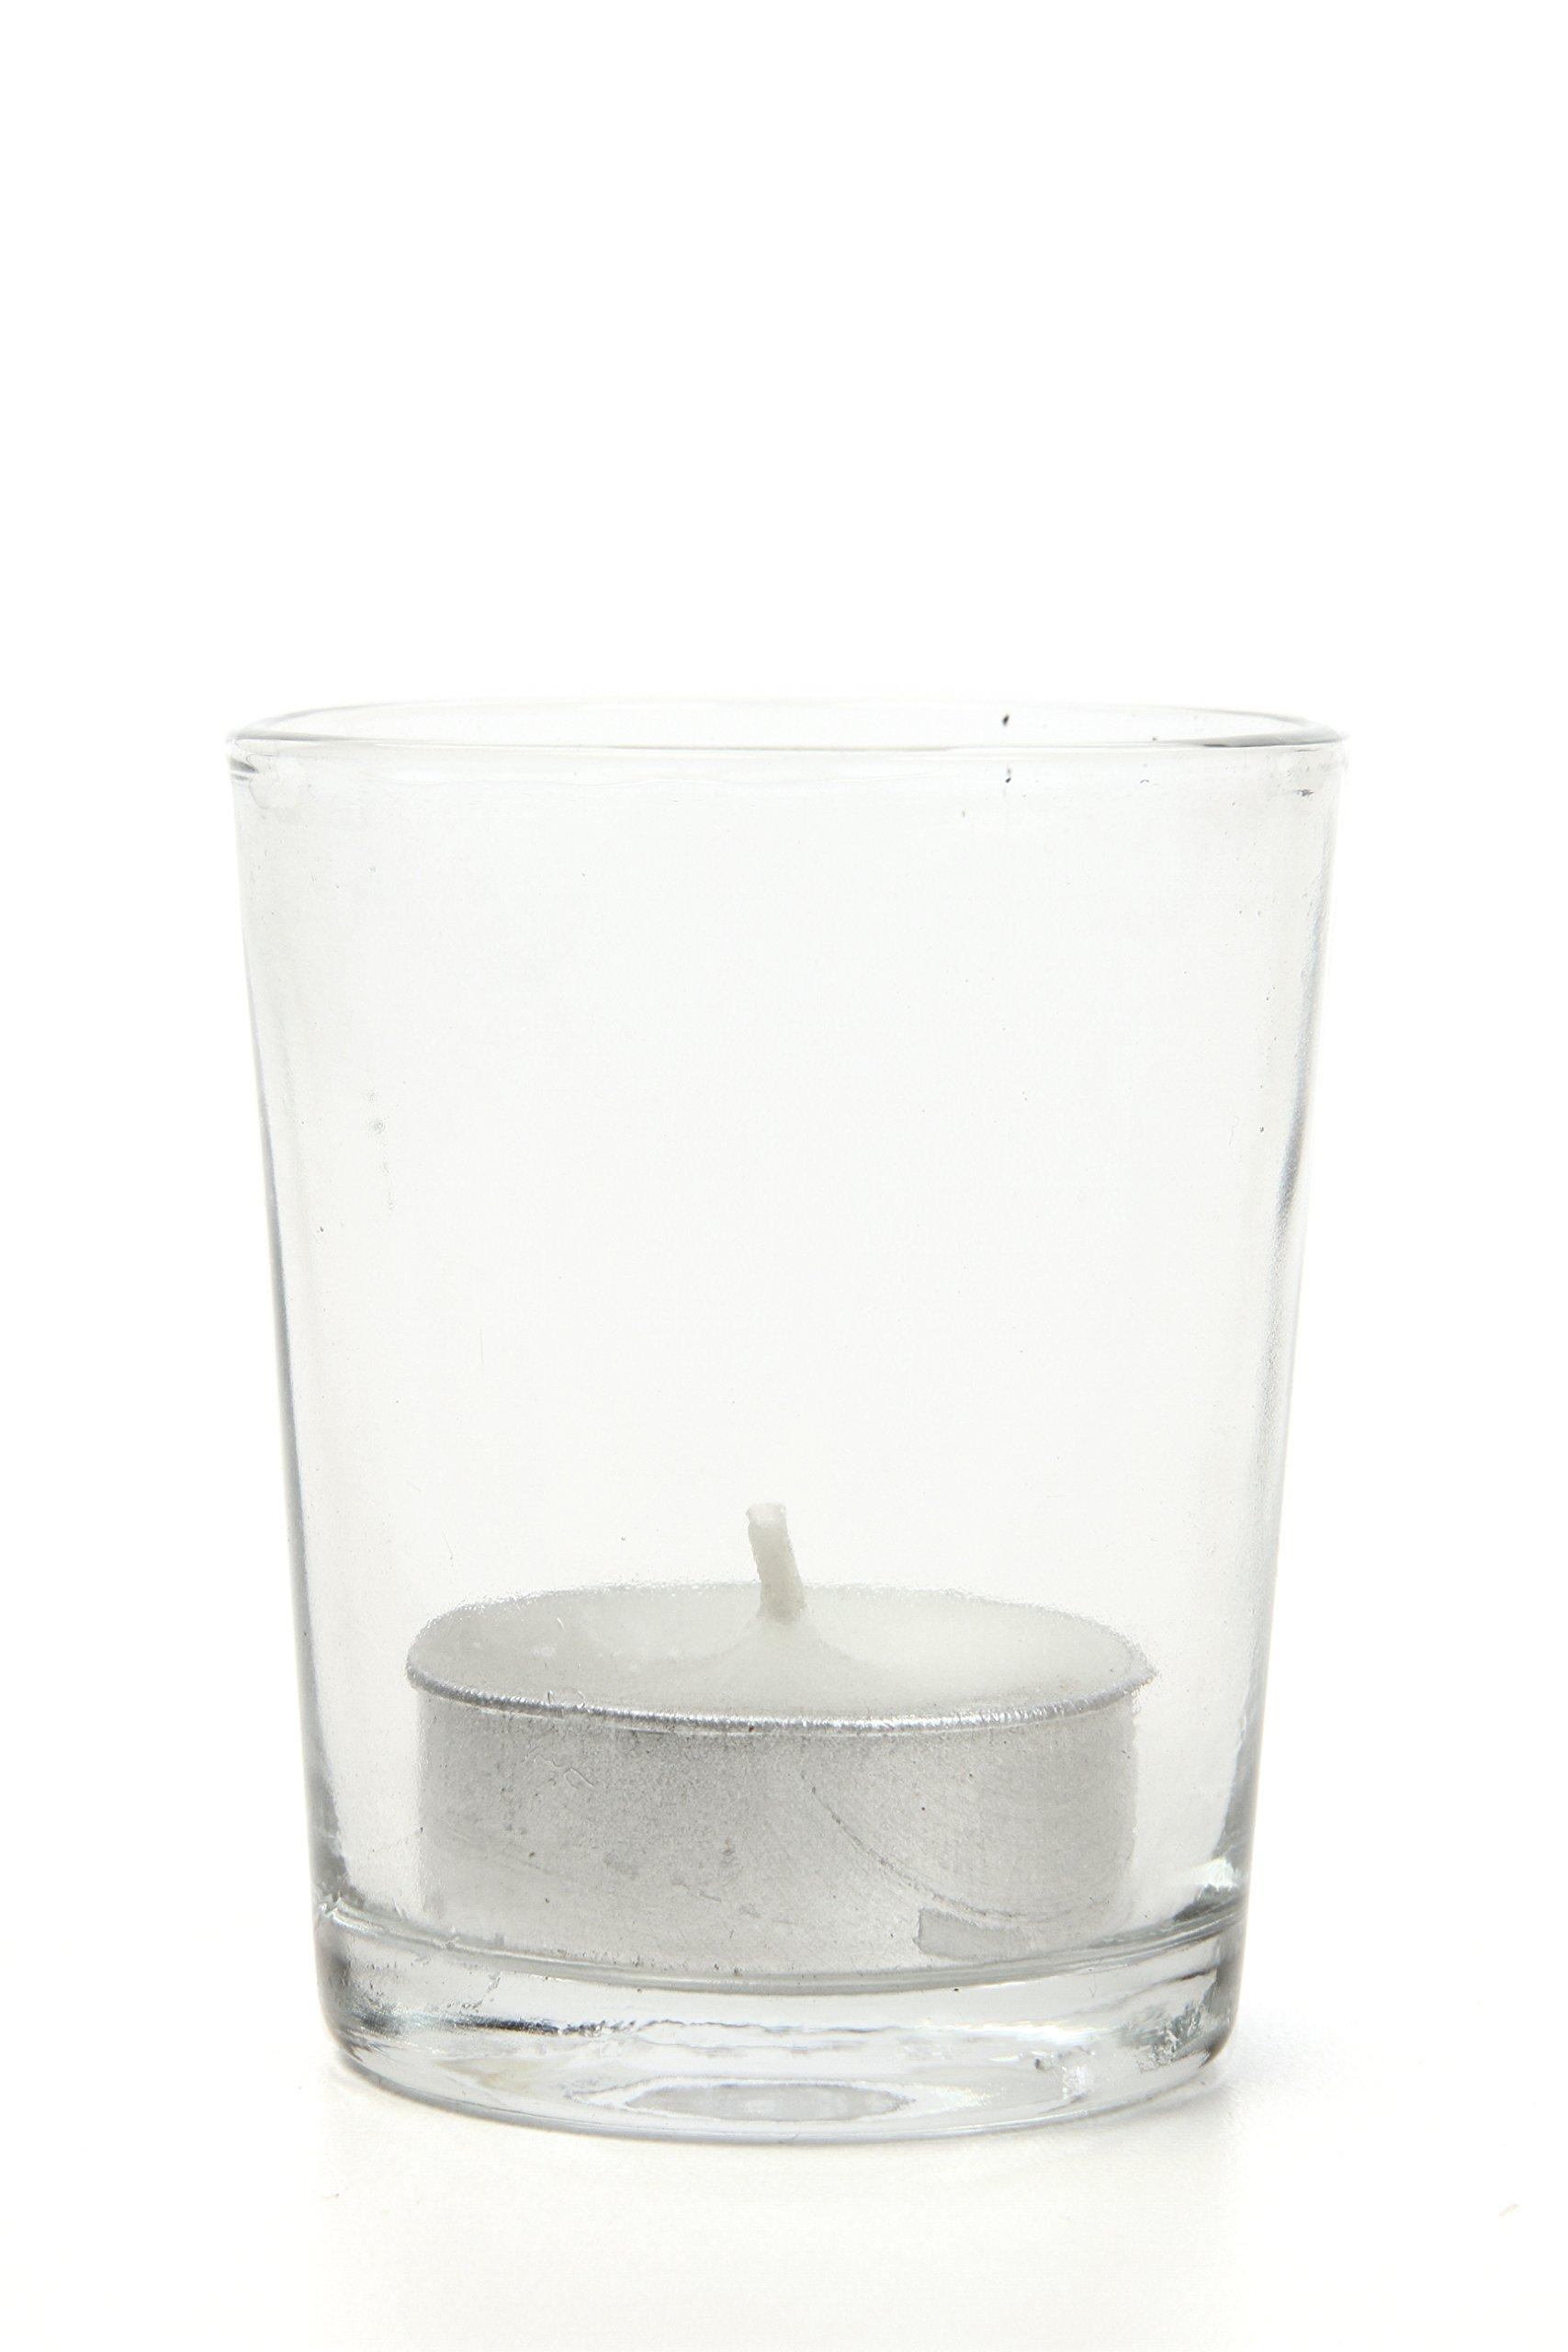 66c8bb7628d4 Details about Hosley Set of 72 Clear Votive Tea Light Glass Candle Holders.  Bulk Buy. Ideal